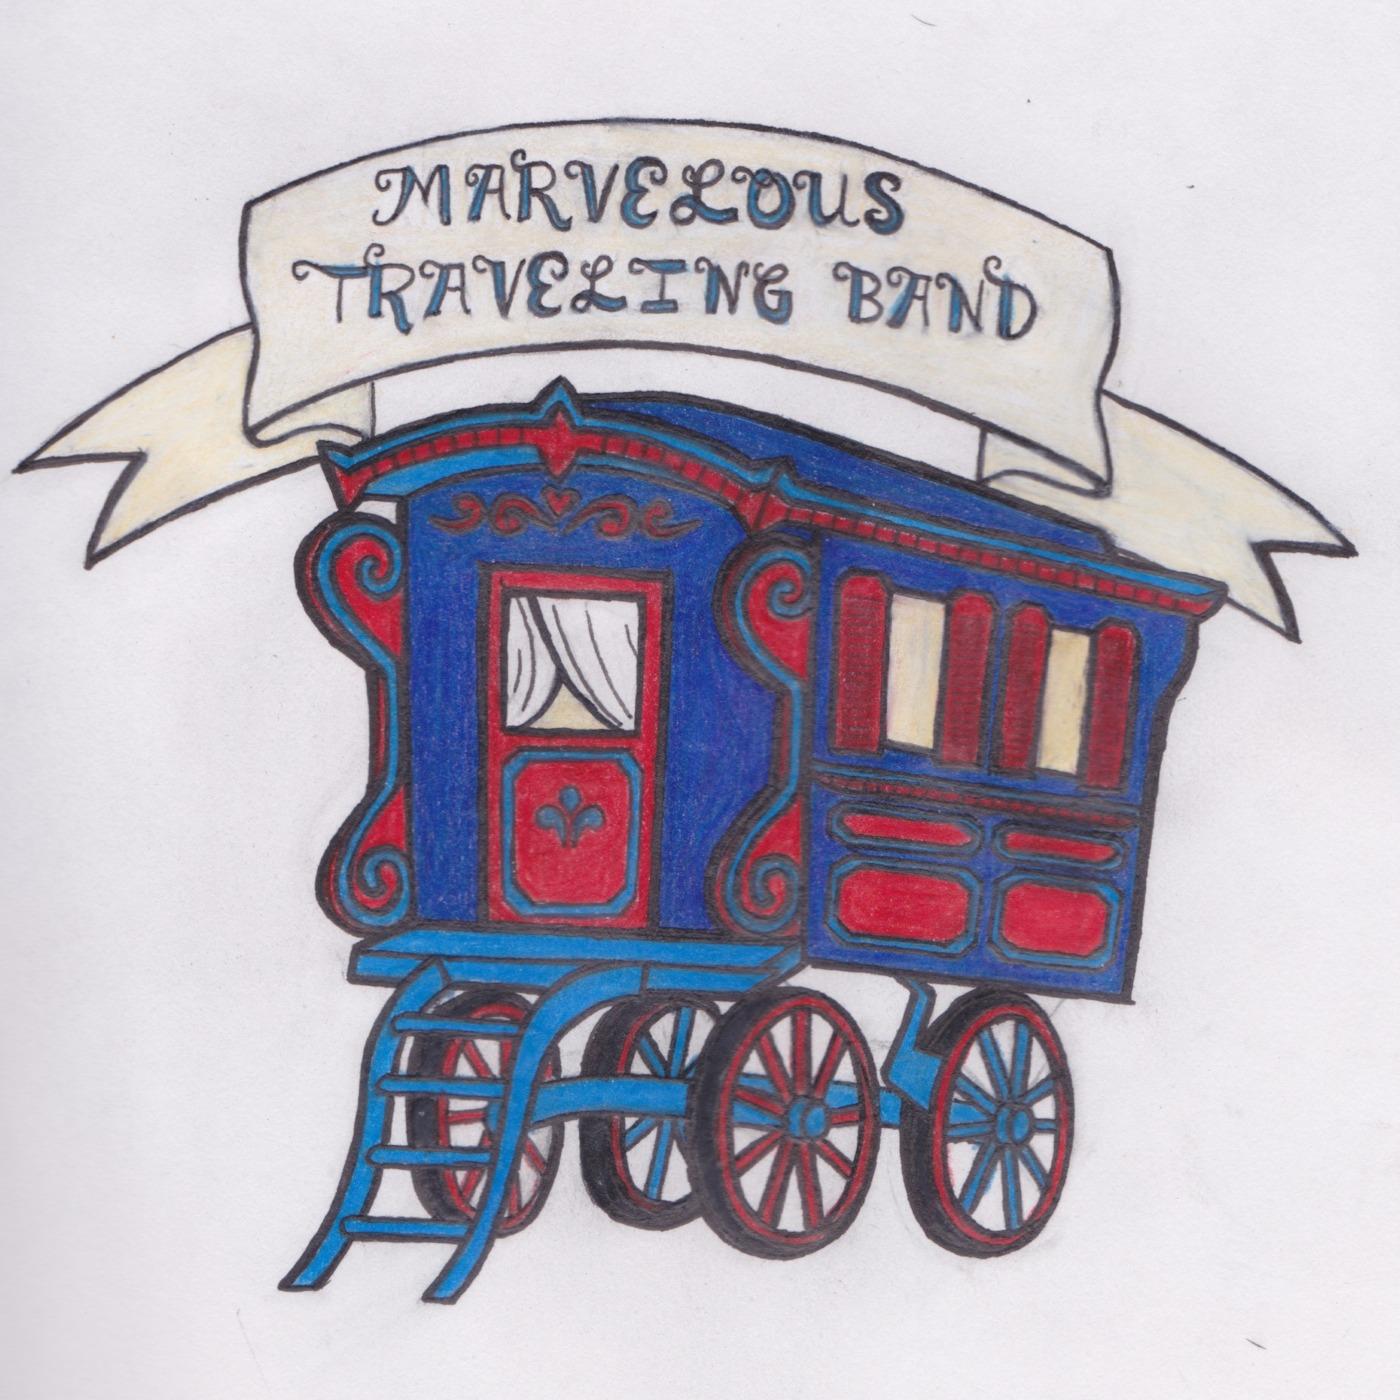 Marvellous Travelling Band & Wonder Emporium